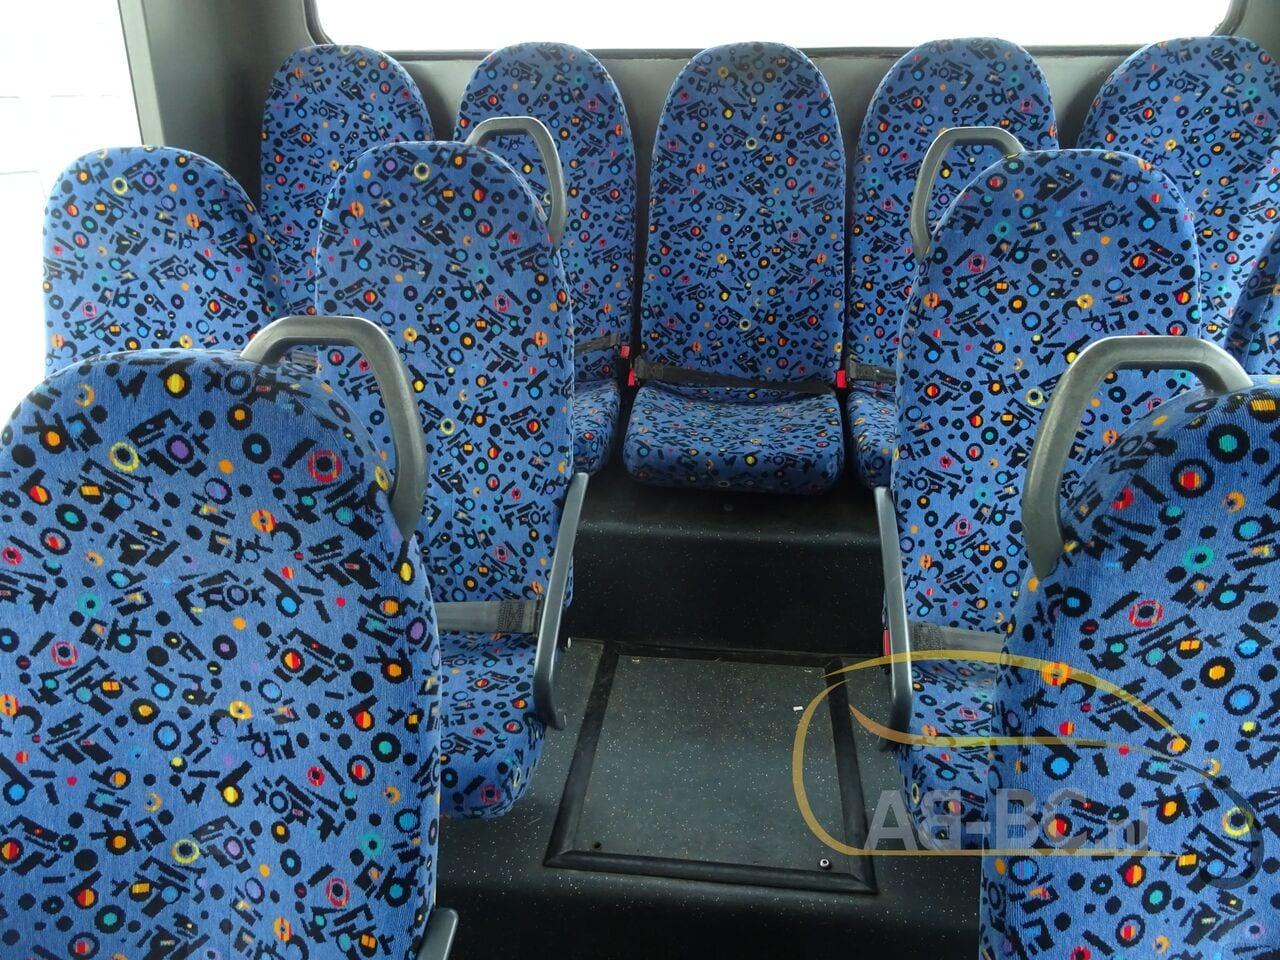 interurban-busMAN-Fast-64-seats---1619620007668988444_big_419ff4dcdd6309933e74e0d01f10988f--21042817163019598600